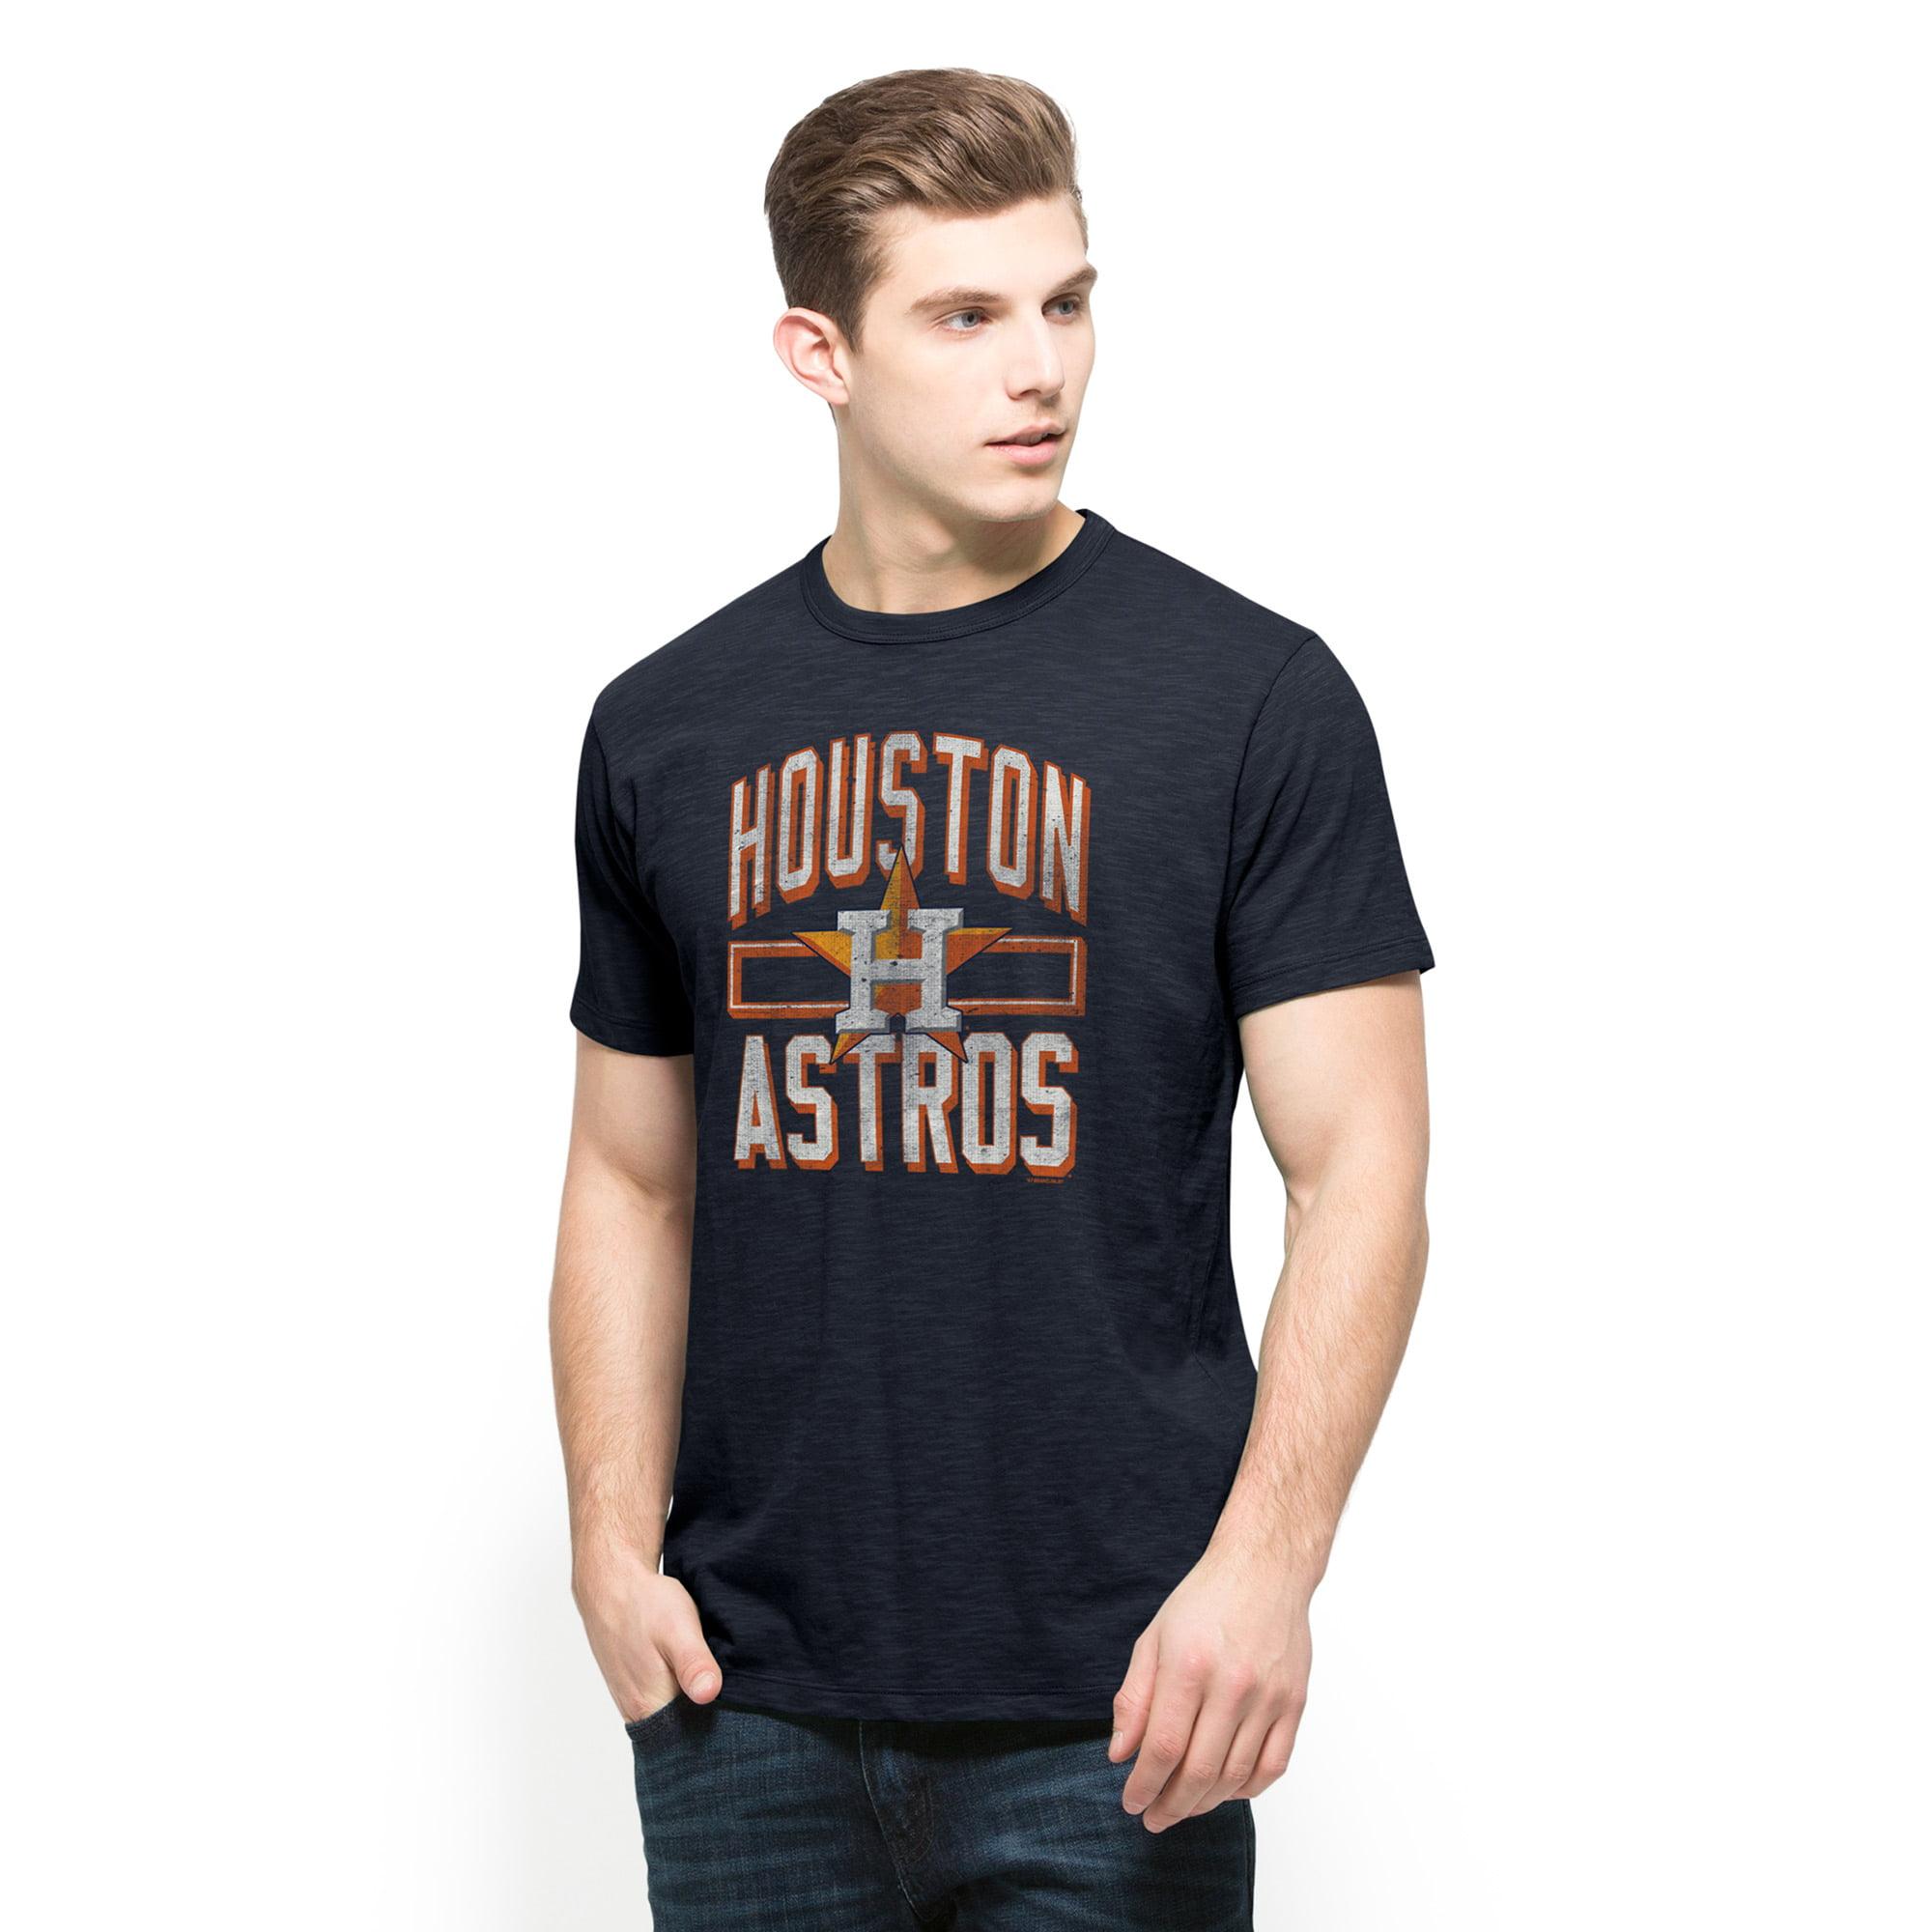 Houston Astros '47 Scrum T-Shirt - Navy